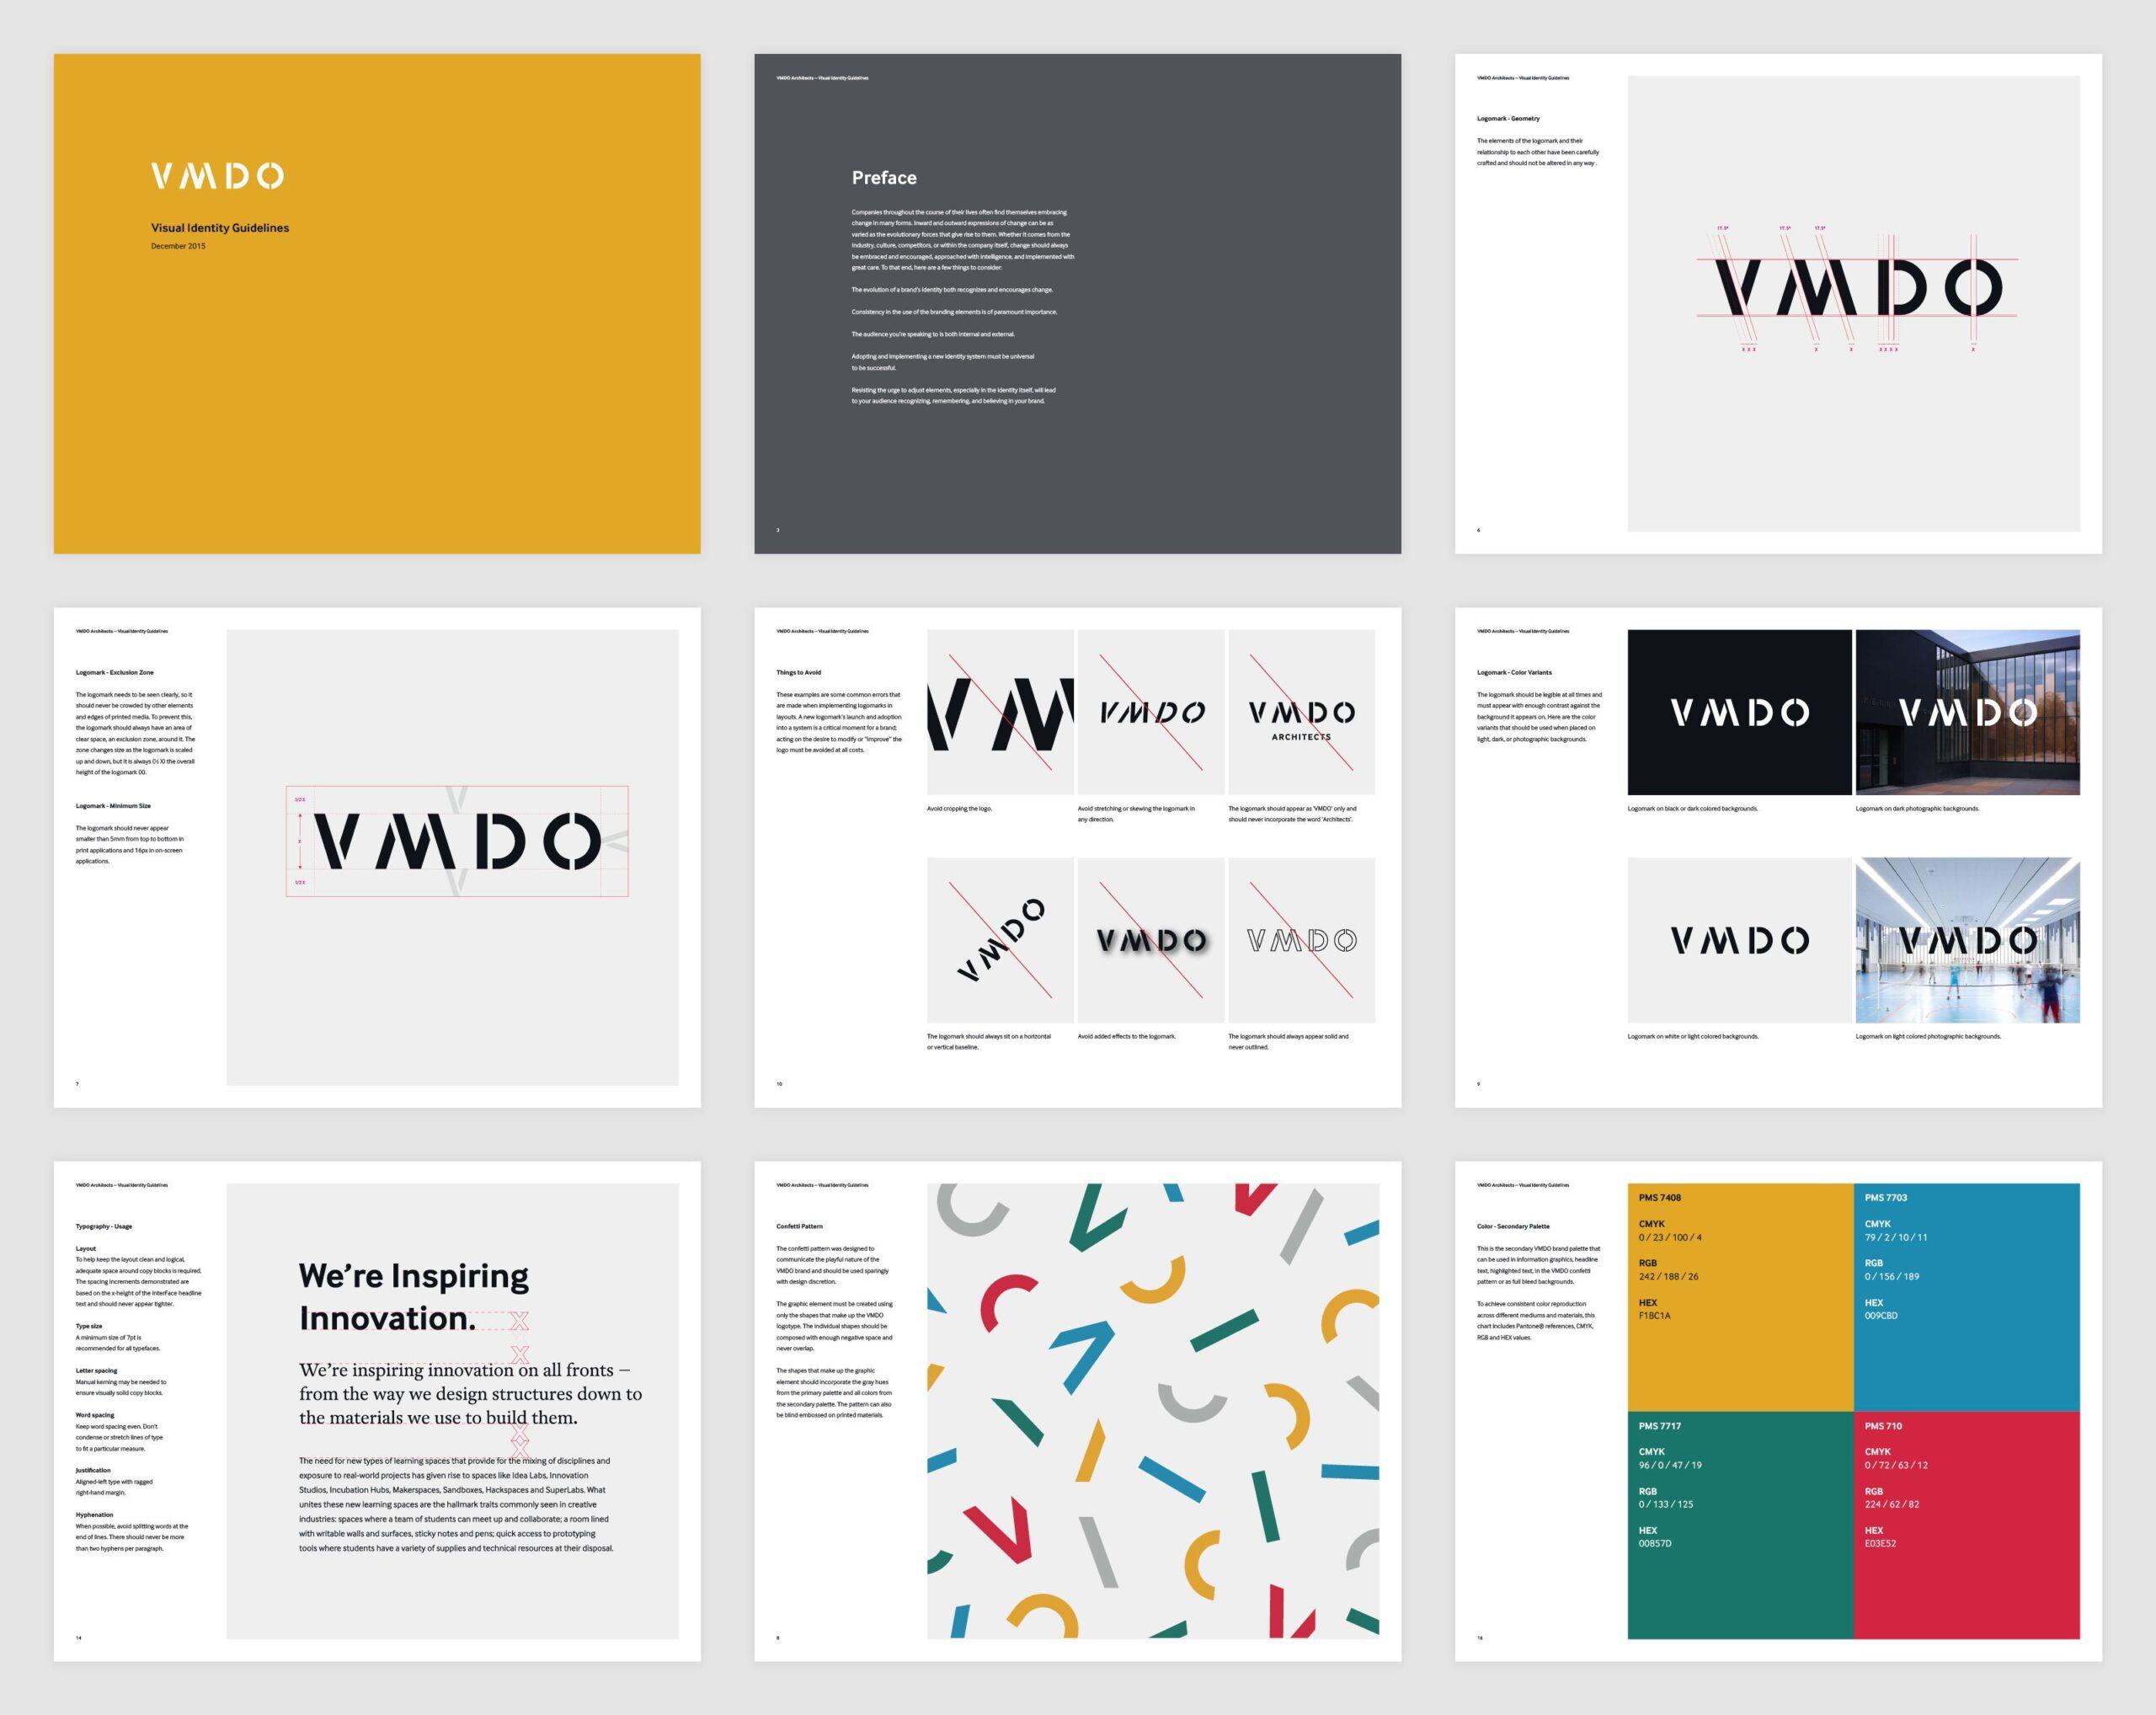 Graphic Design Guidelines